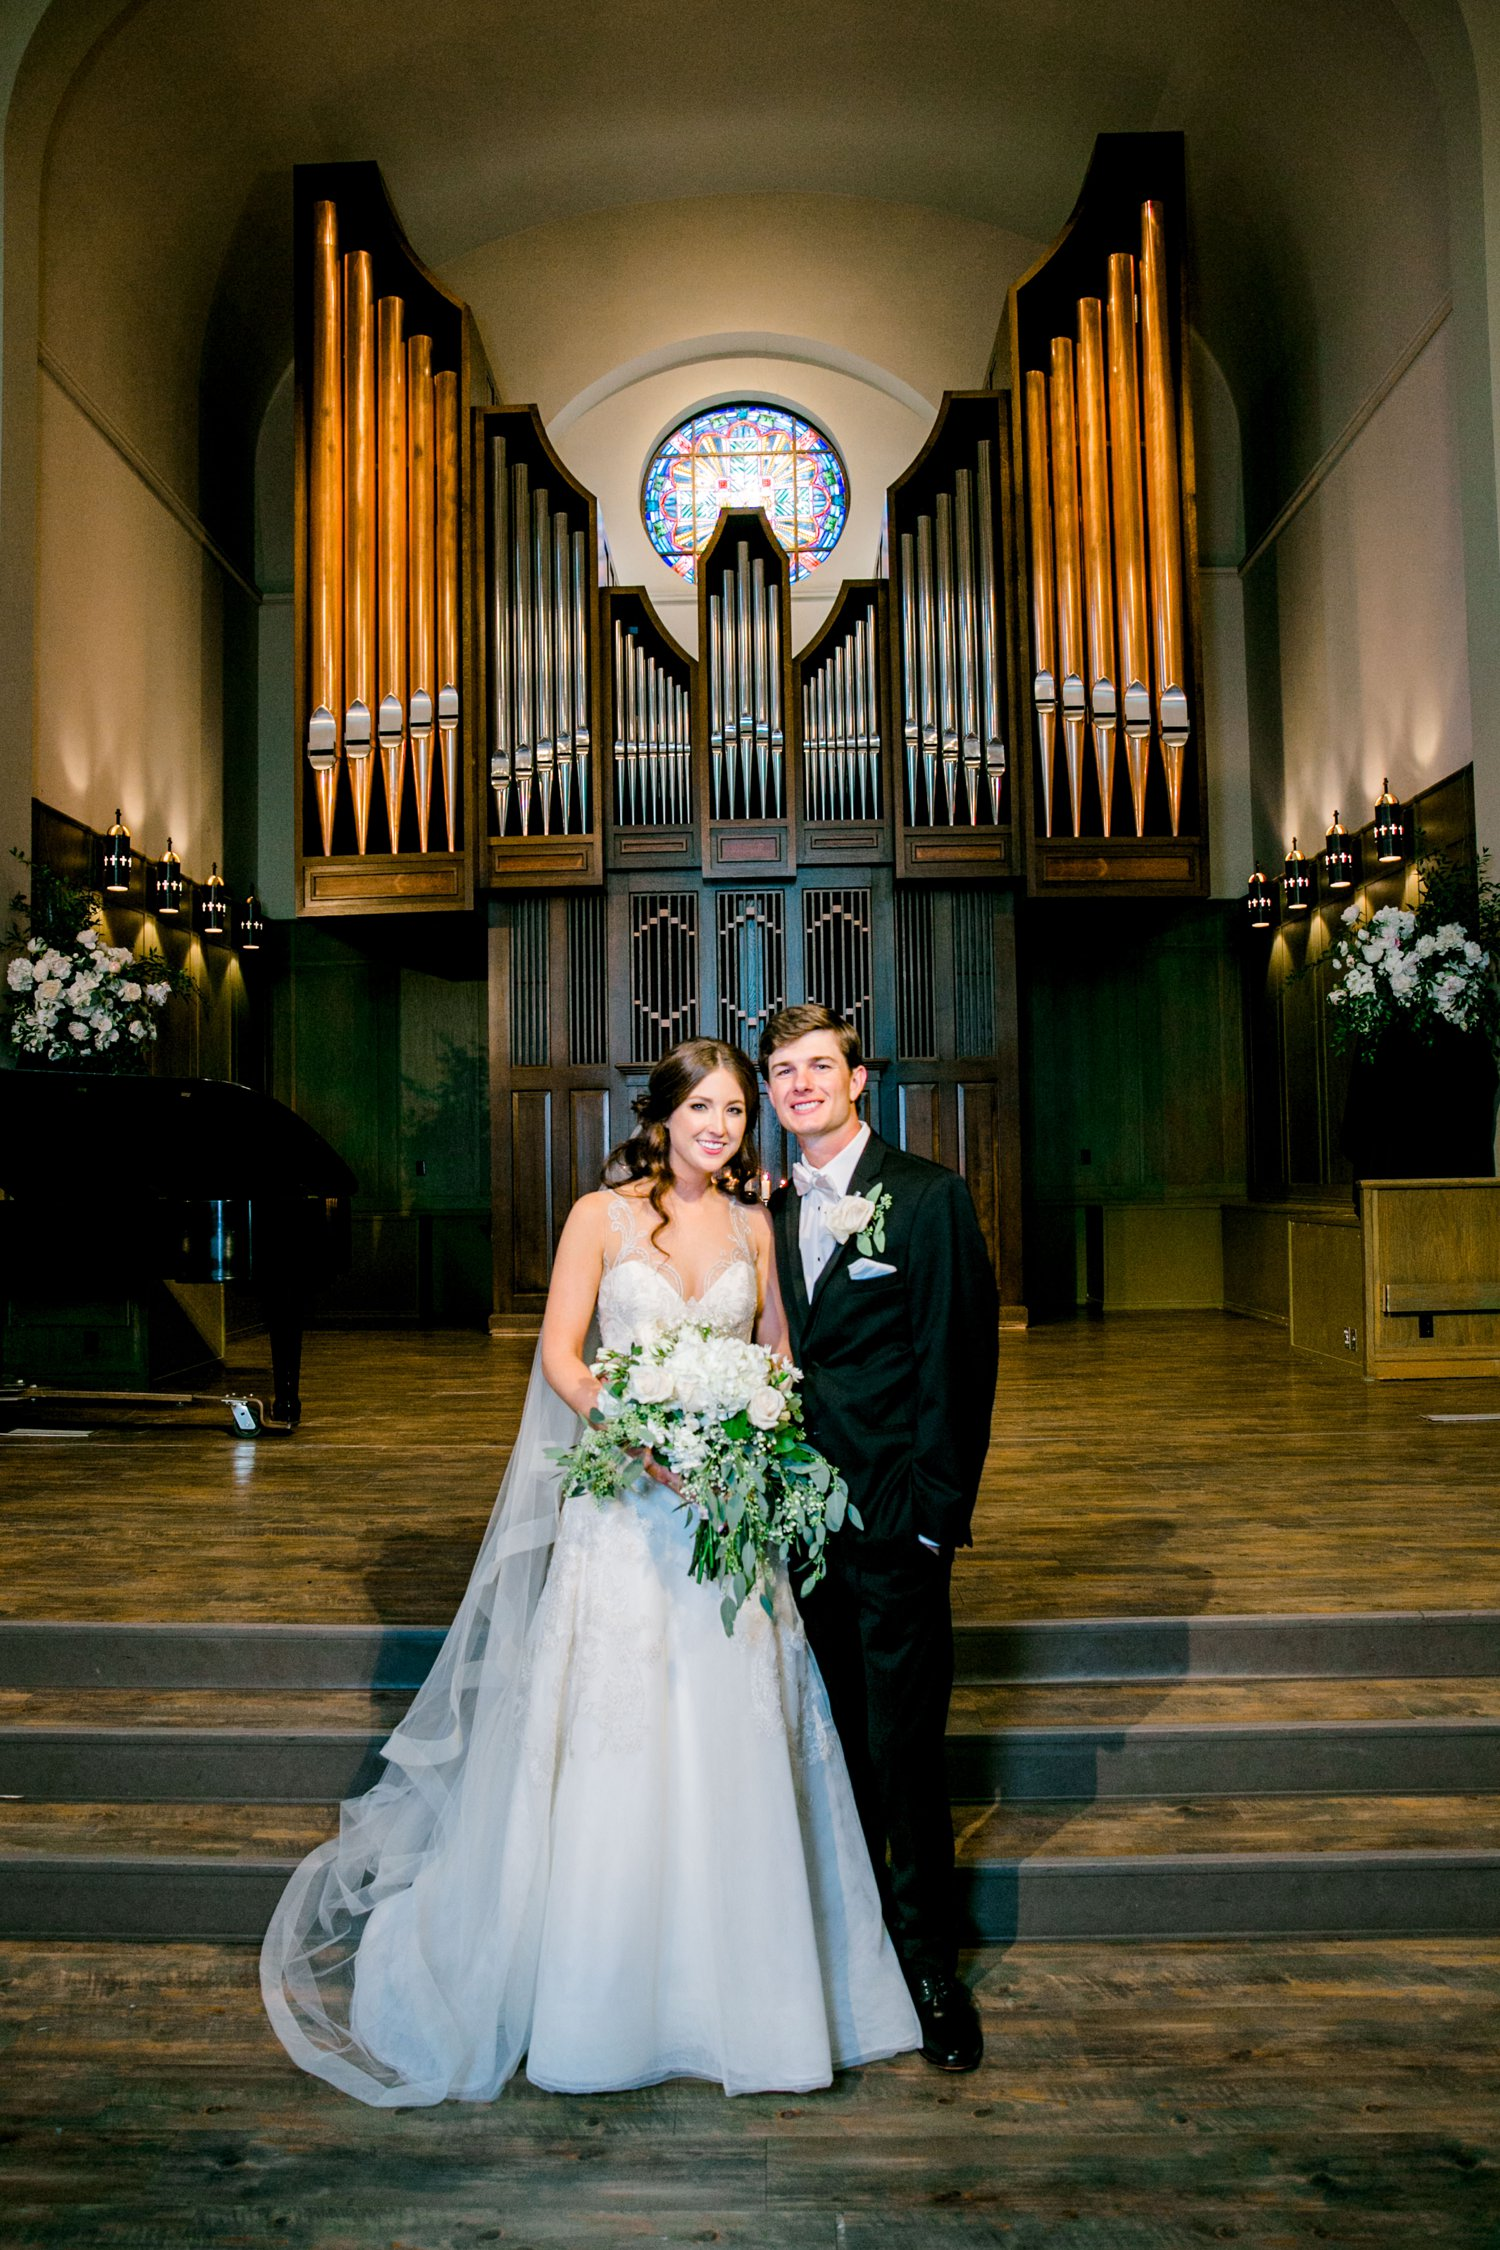 Hunter_and_Molly_Rawls_ALLEEJ_Lubbock_WEDDING_Legacy_Event_Center_0127.jpg